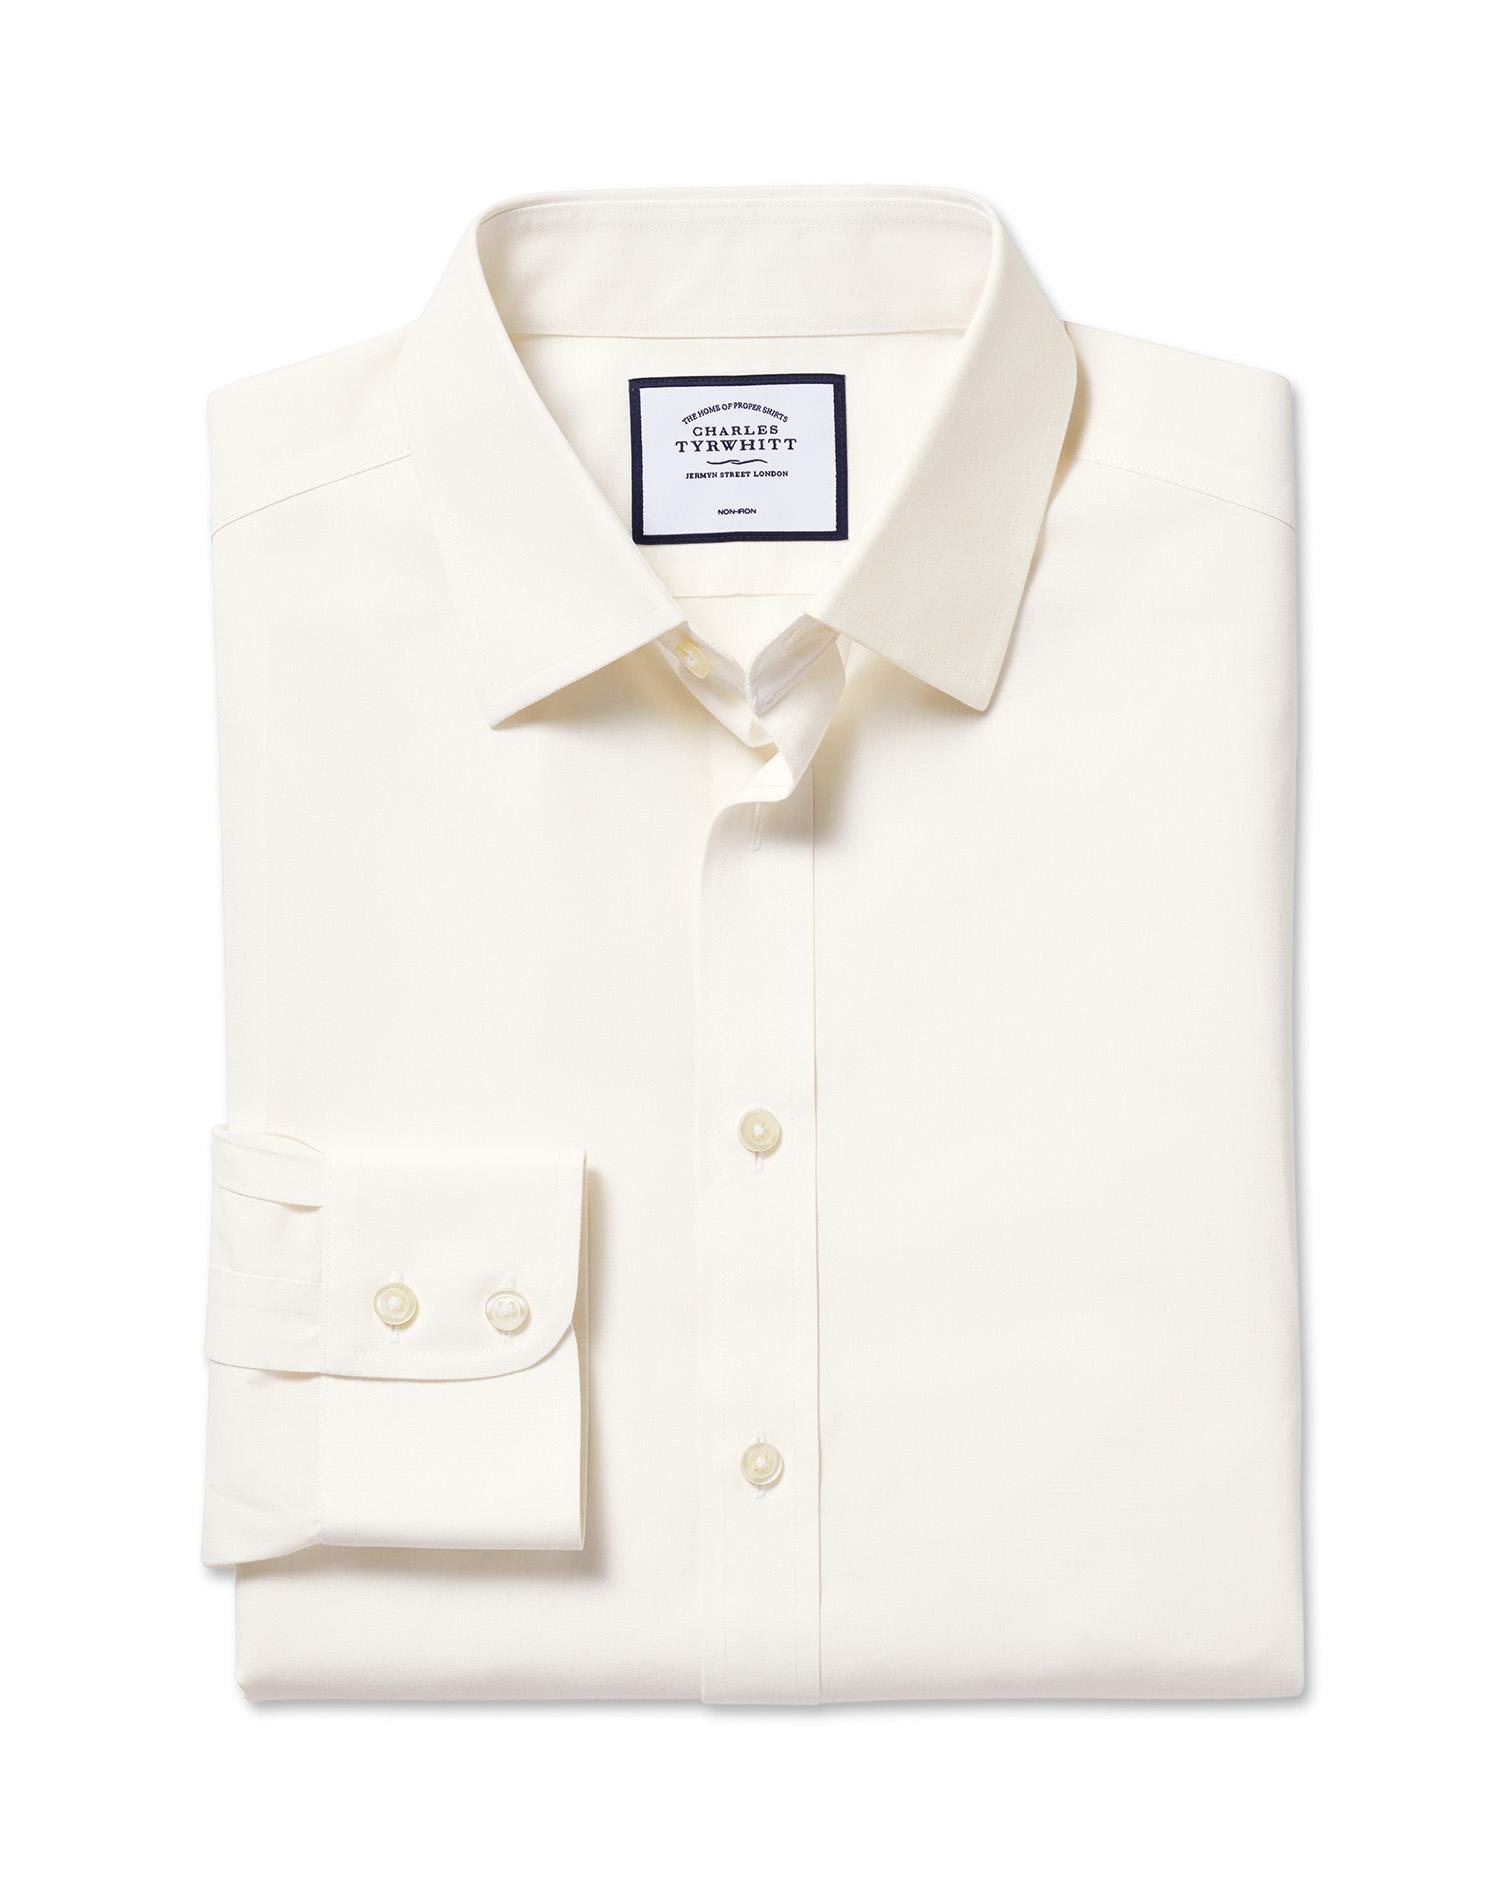 Slim Fit Non-Iron Poplin Cream Cotton Formal Shirt Single Cuff Size 17.5/36 by Charles Tyrwhitt